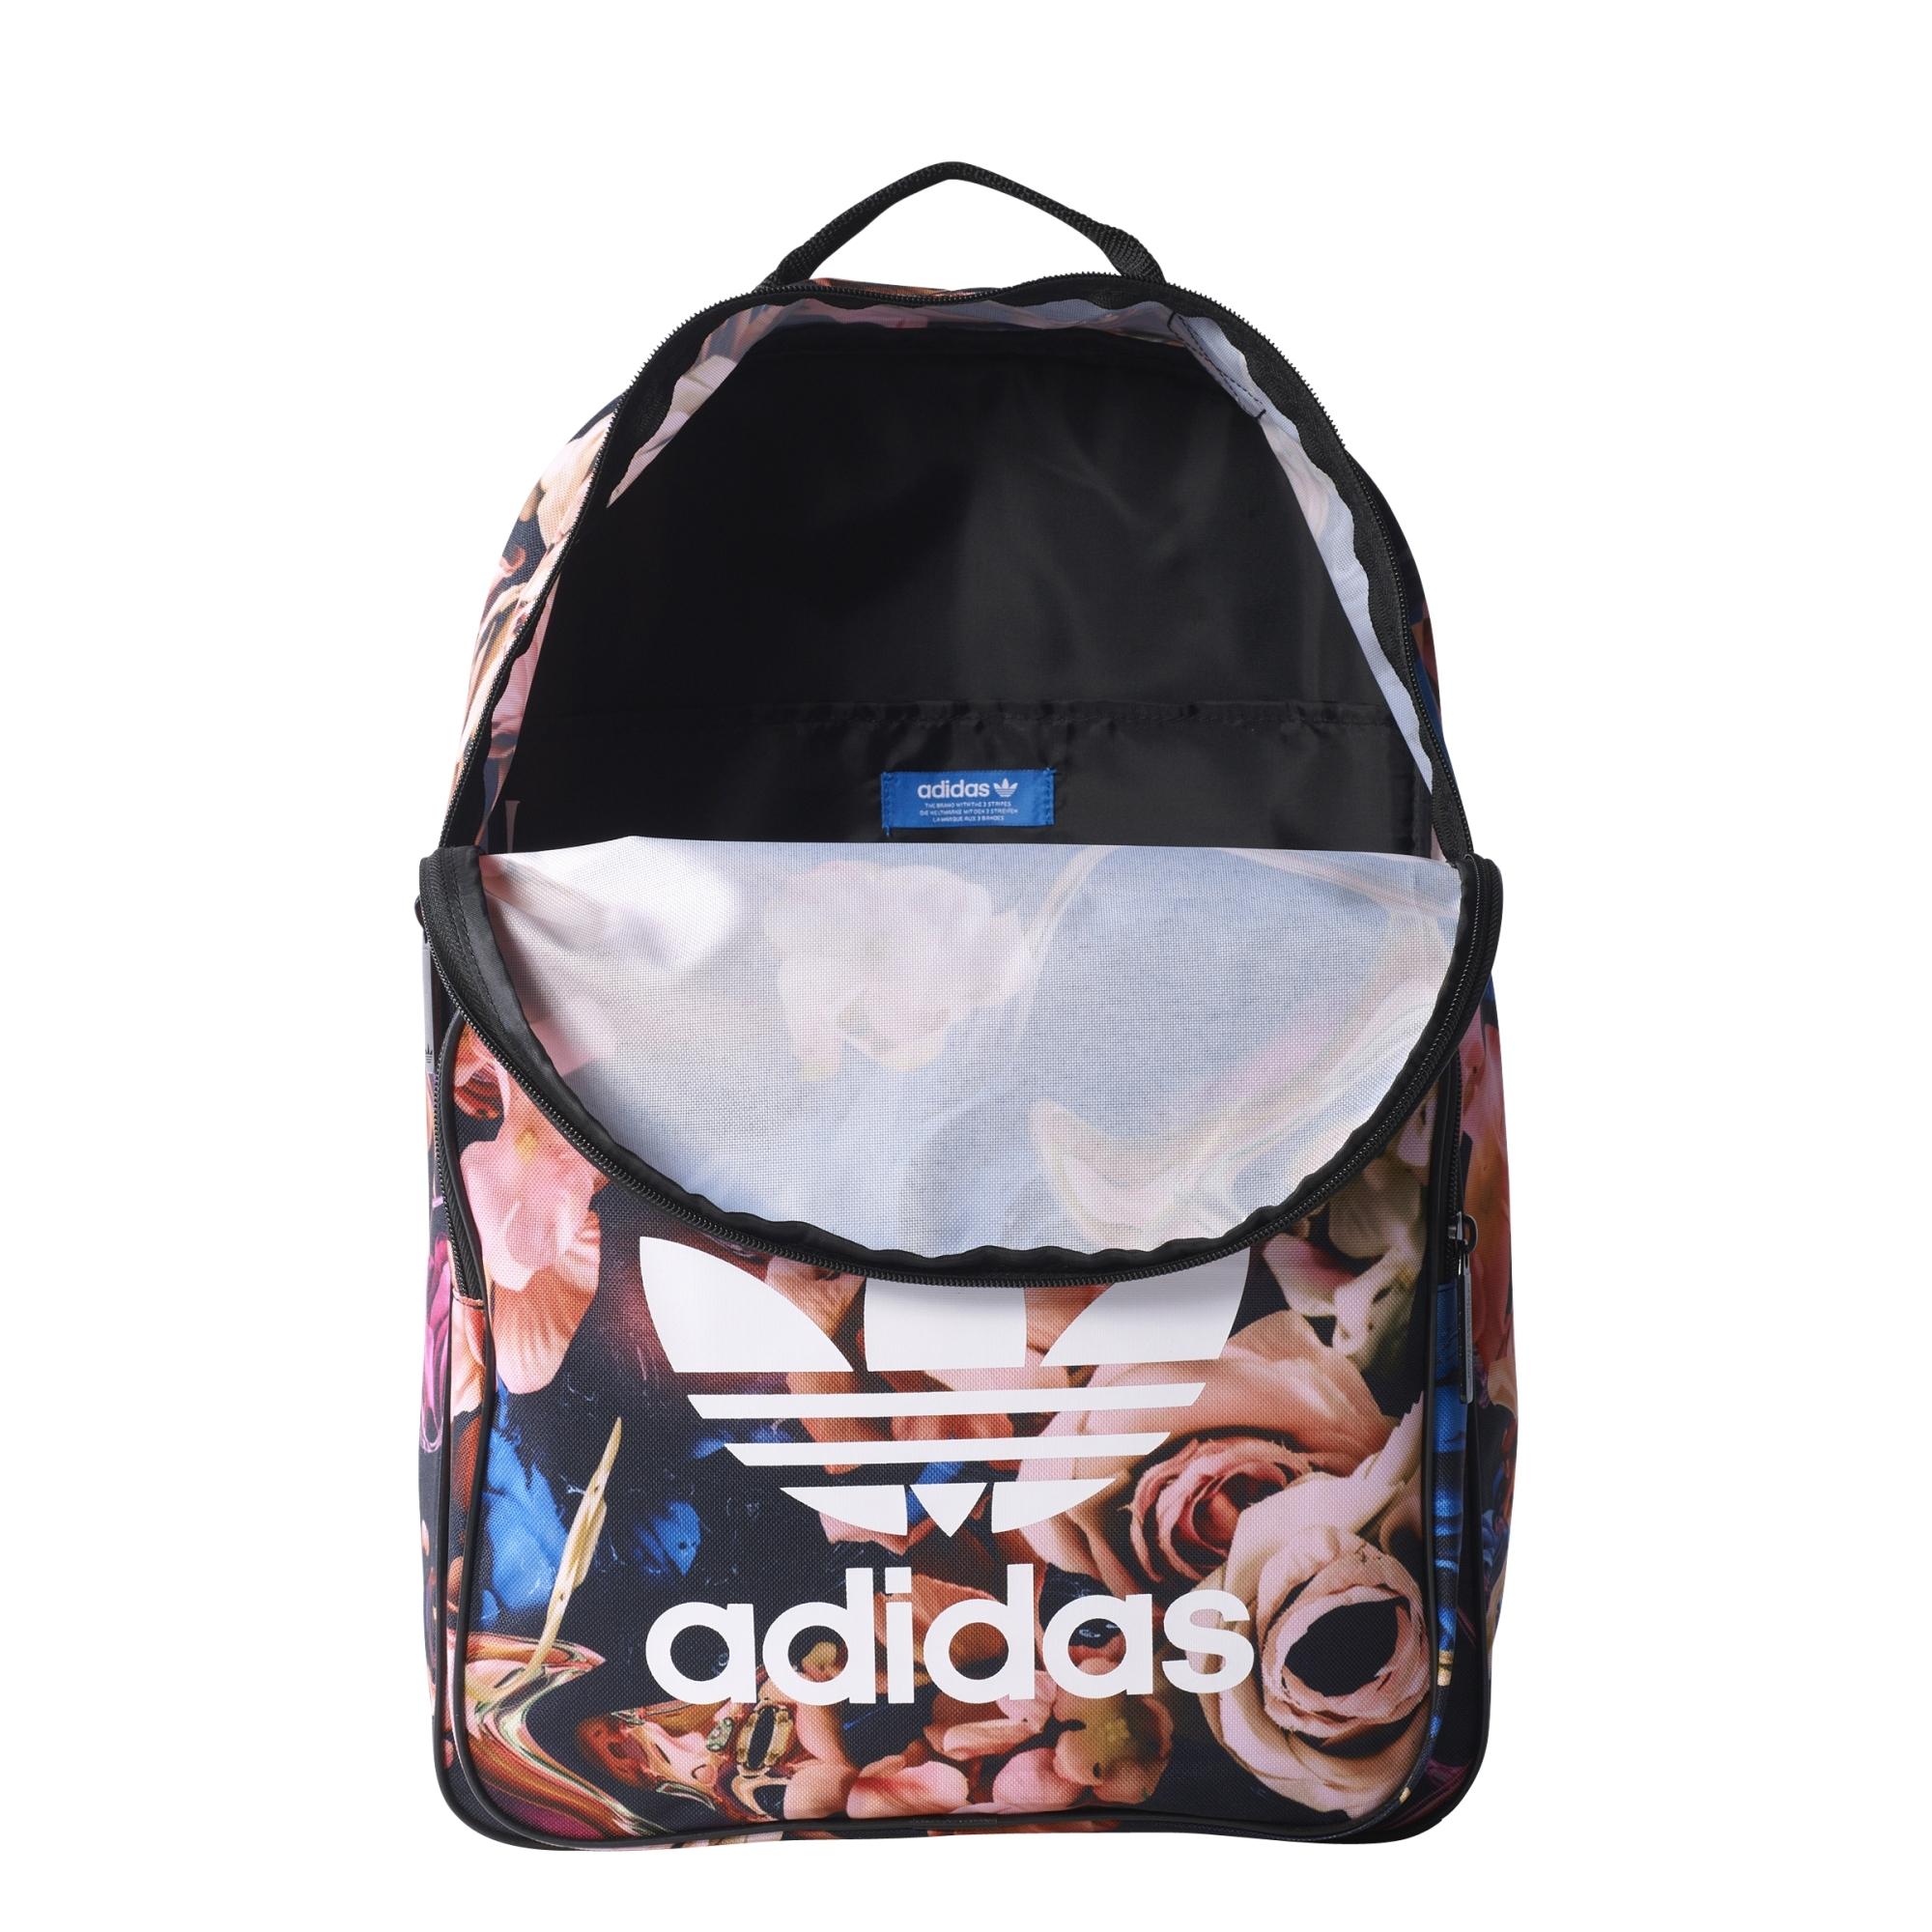 ... Adidas Originals Classic Backpack